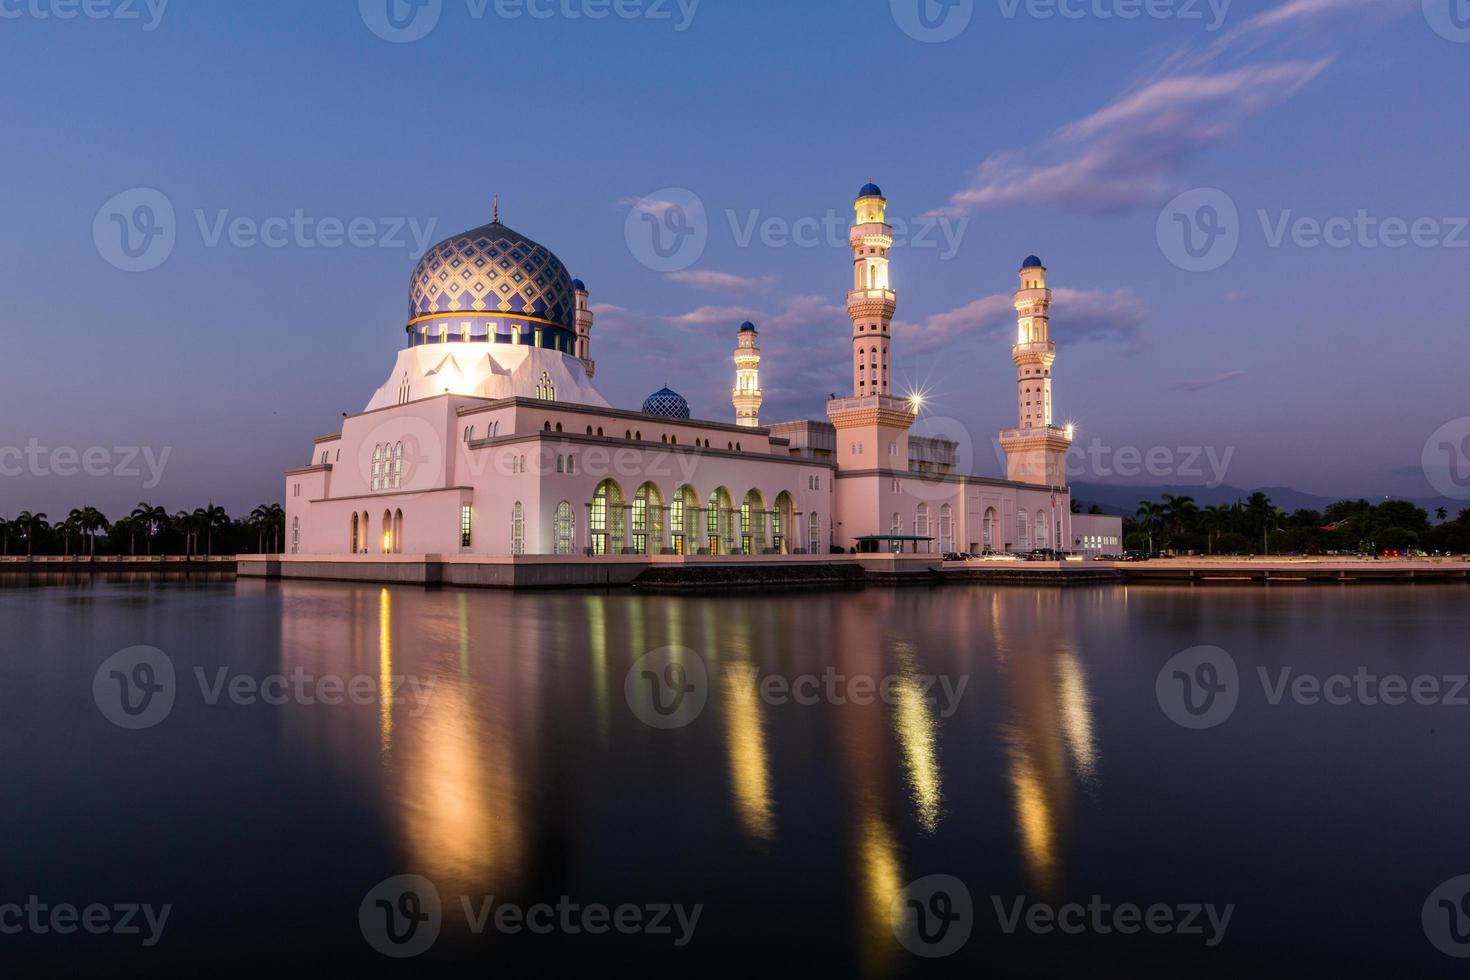 Kota Kinabalu City Floating Mosque, Sabah Borneo East Malaysia photo